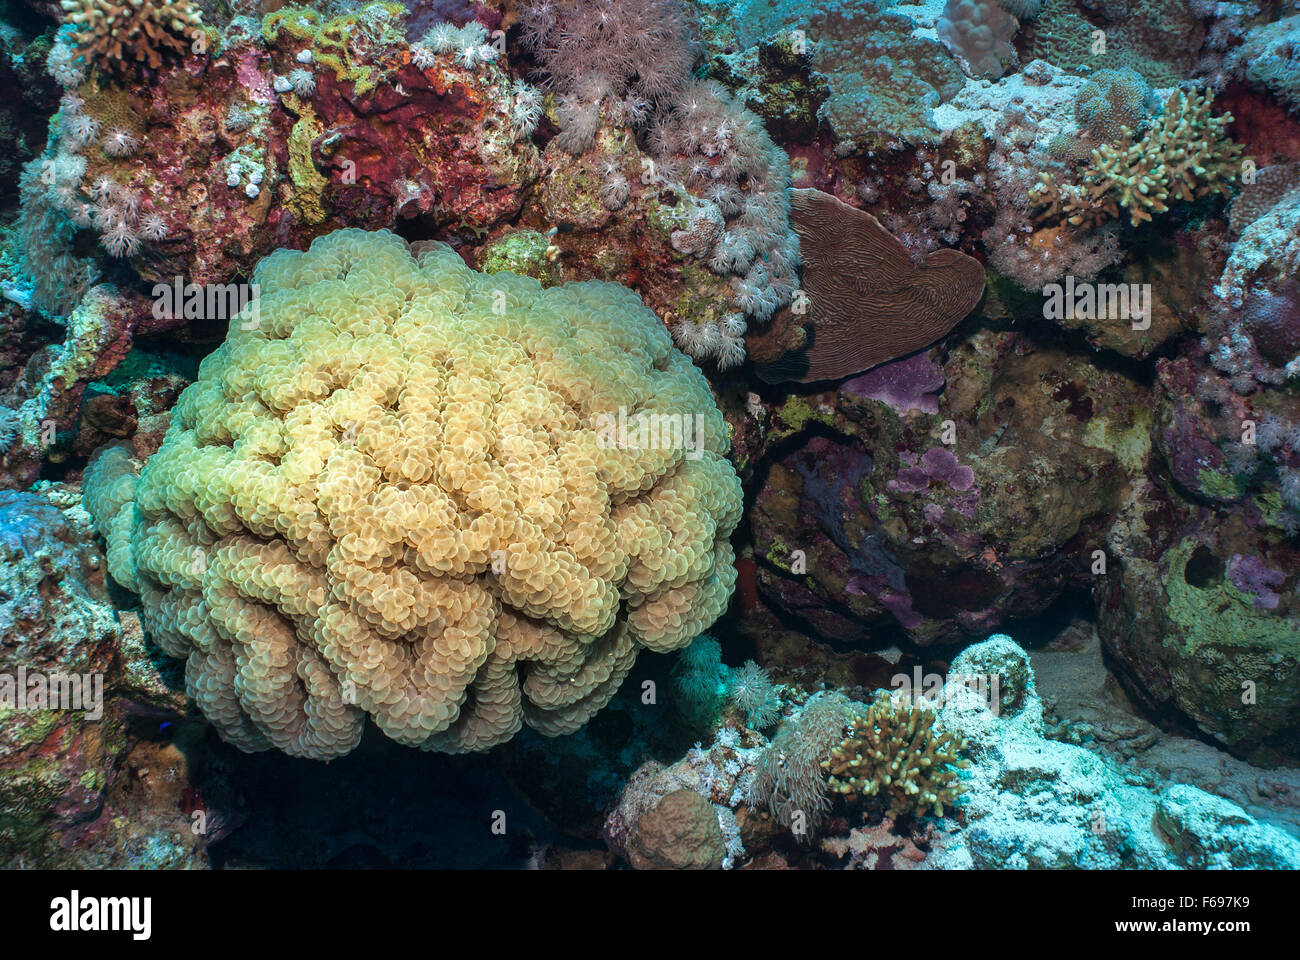 Bolla di corallo, Plerogyra sinuosa, Caryophylliidae, Sharm el Sheikh, Mar Rosso, Egitto Immagini Stock